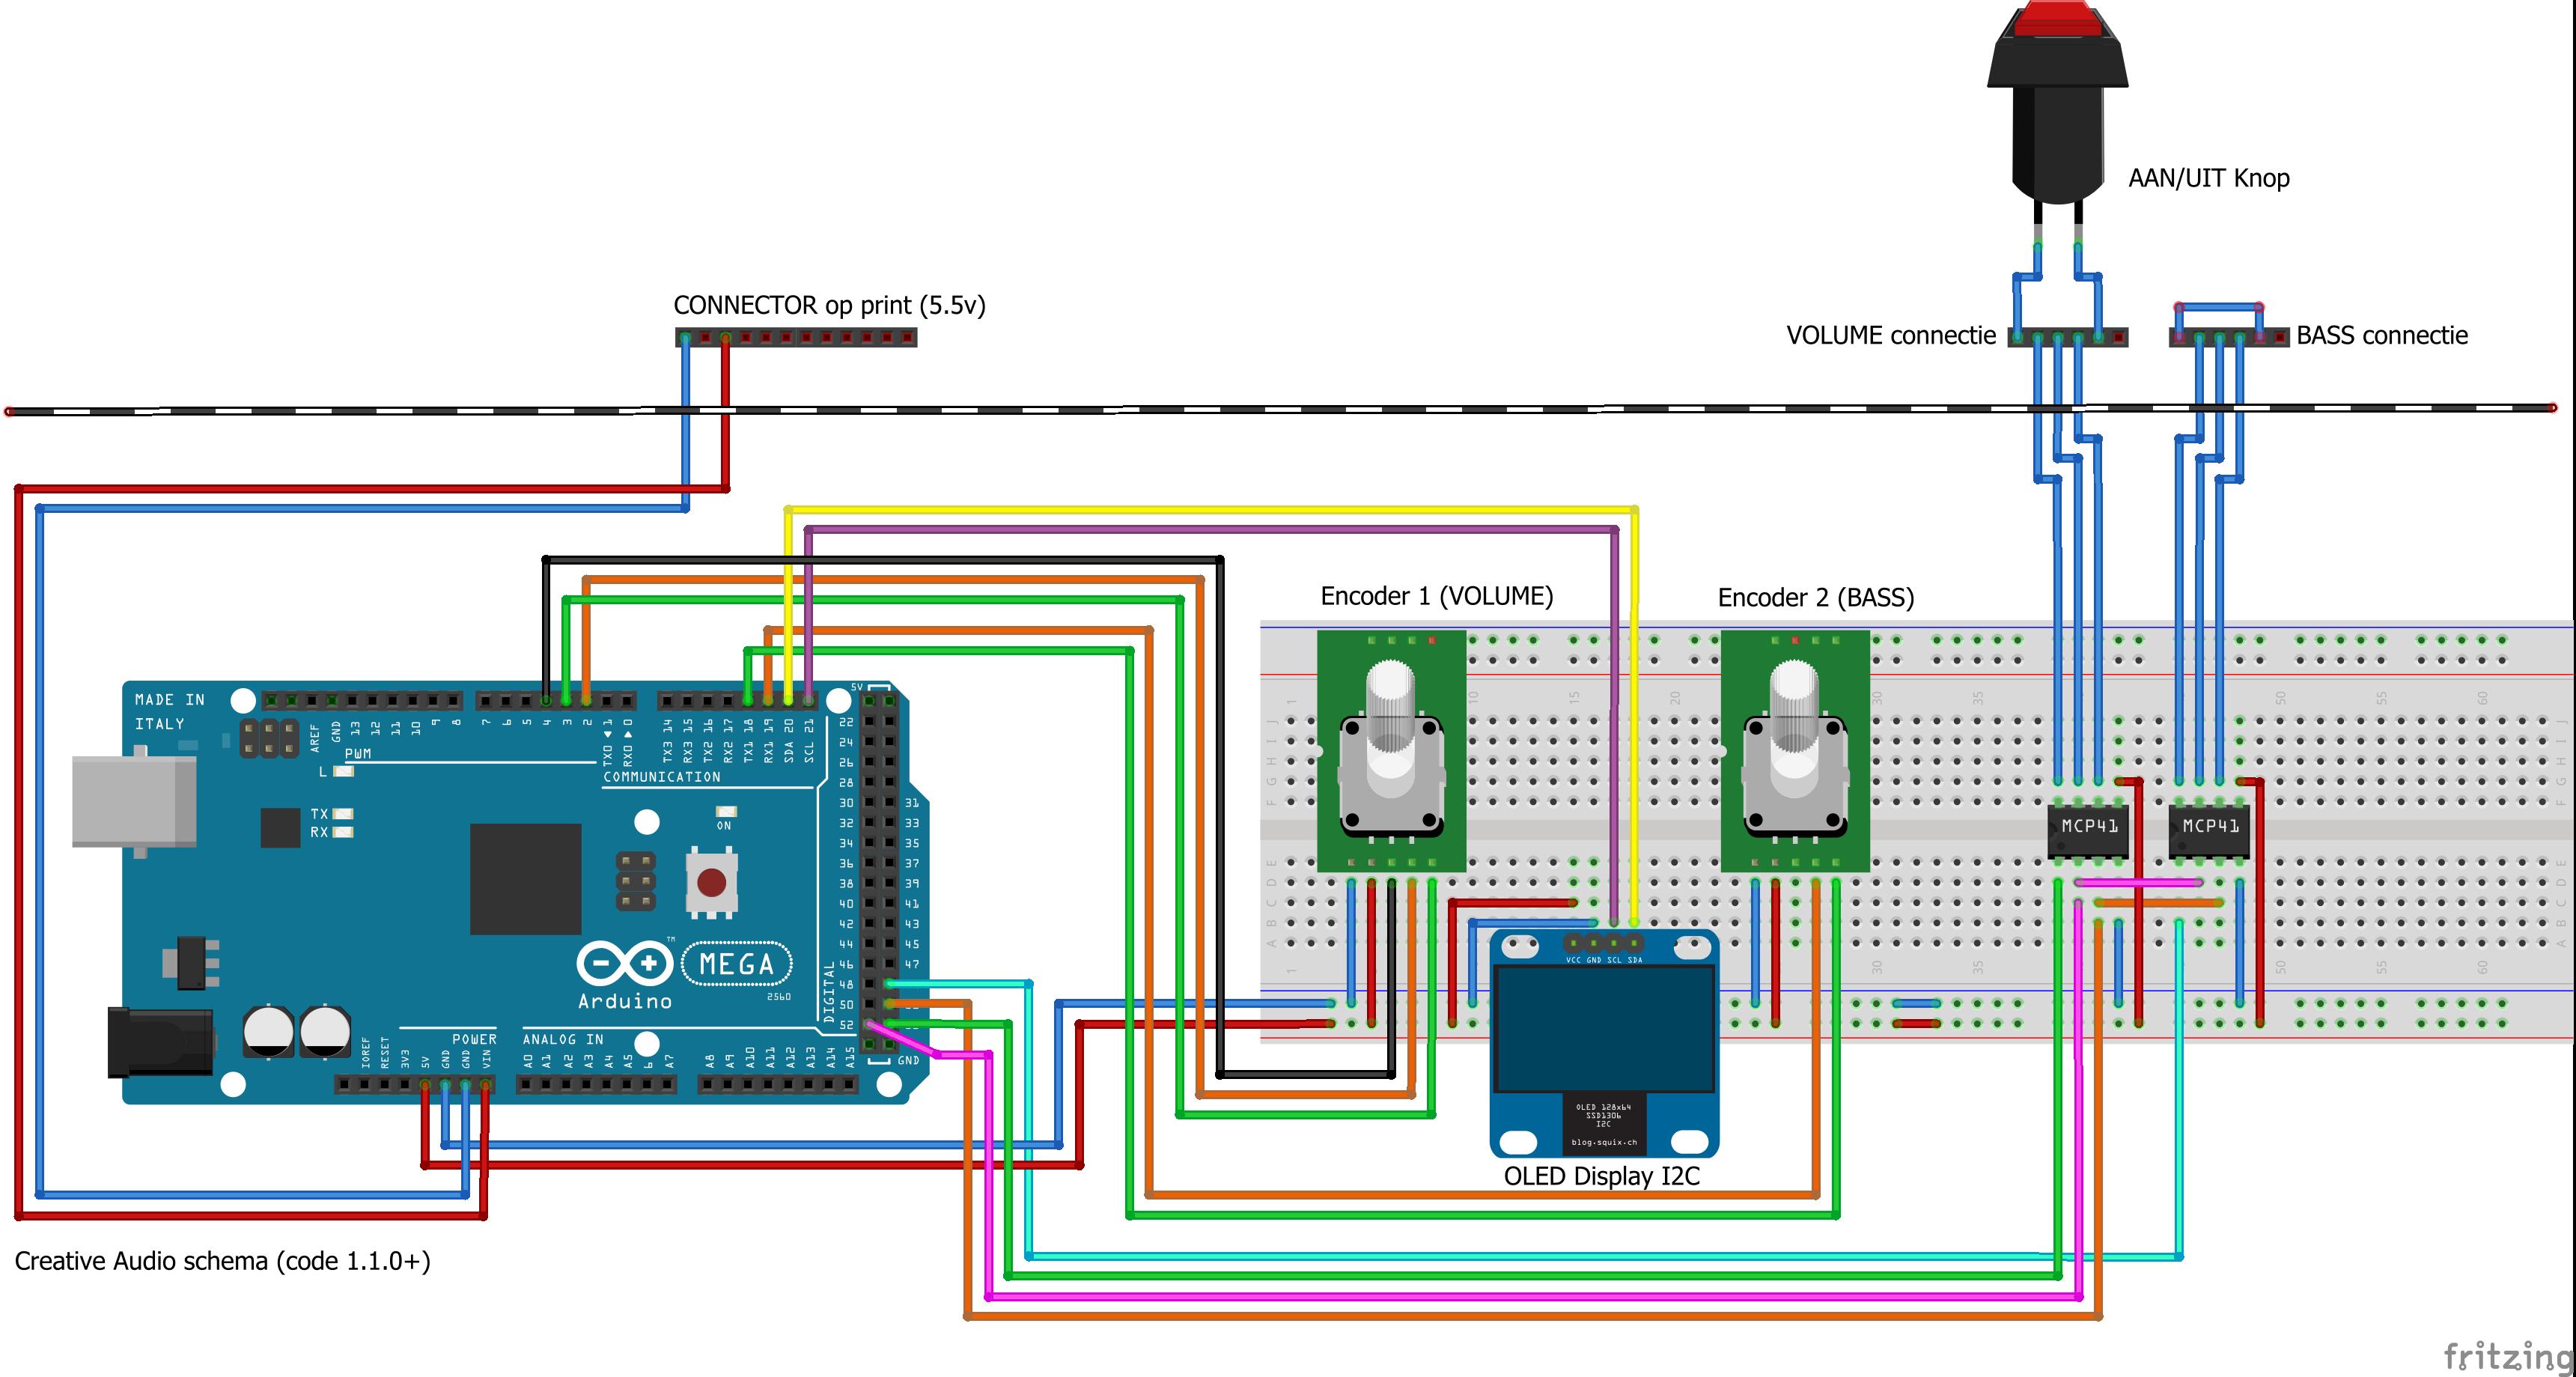 Fritzing - Creative audio schema (code v1.1.0+)